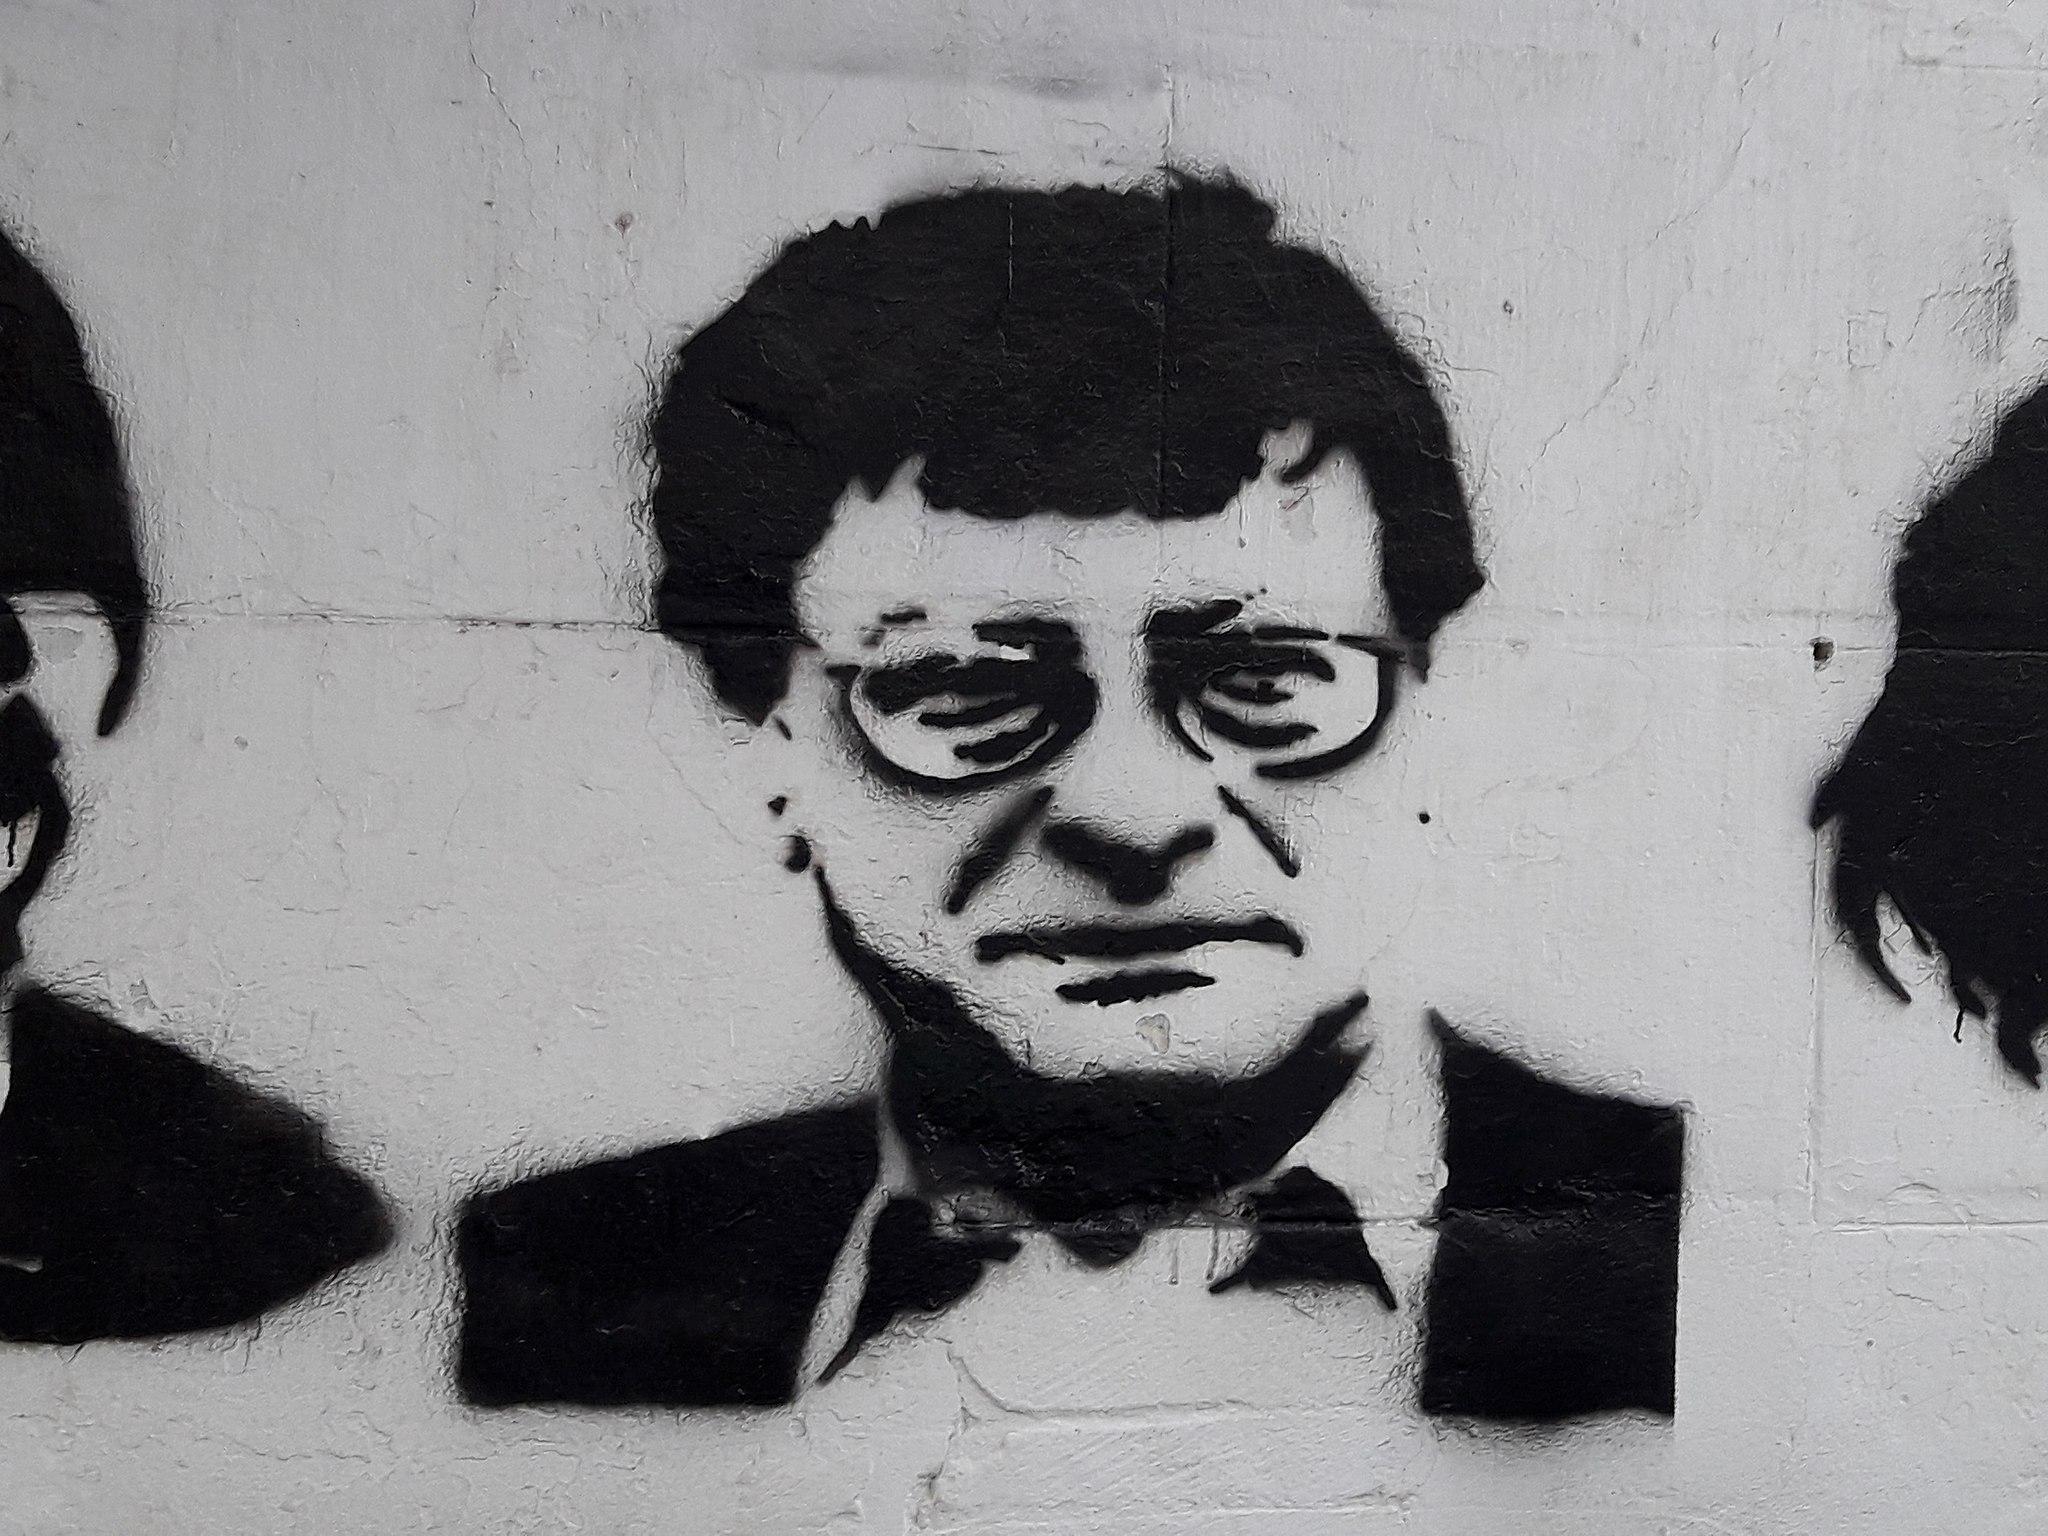 Mural of Mahmoud Darwish in downtown Tunis, Tunisia, 2017. (Emna Mizouni via Wikimedia Commons)